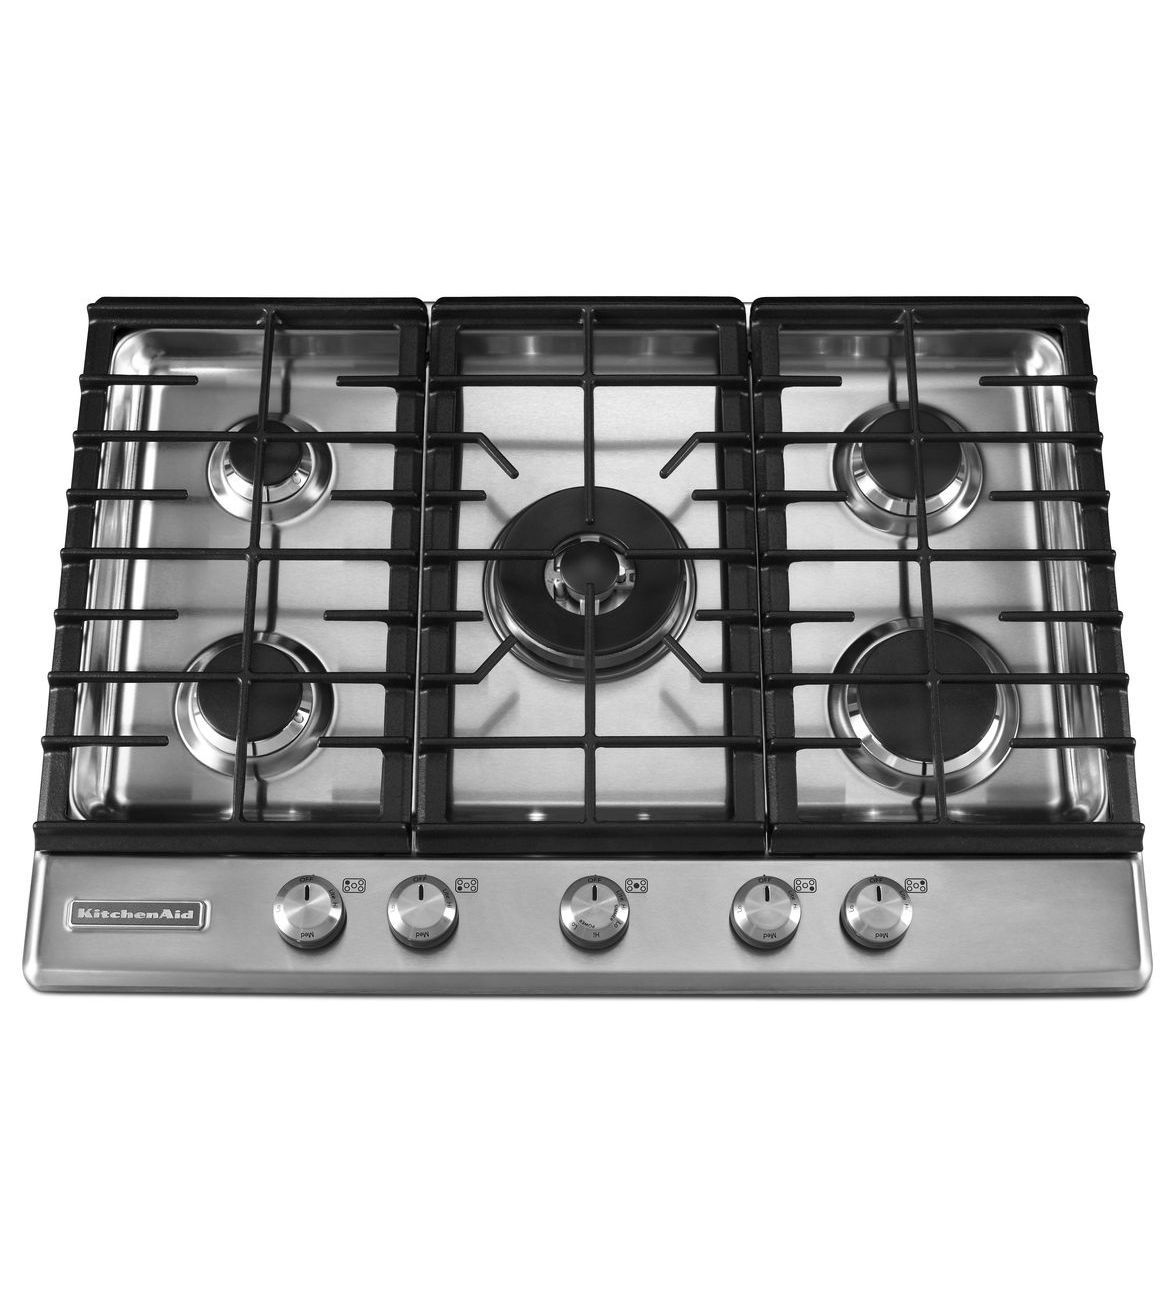 KitchenAid® 30 Inch 5 Burner Gas Cooktop, Architect® Series II (